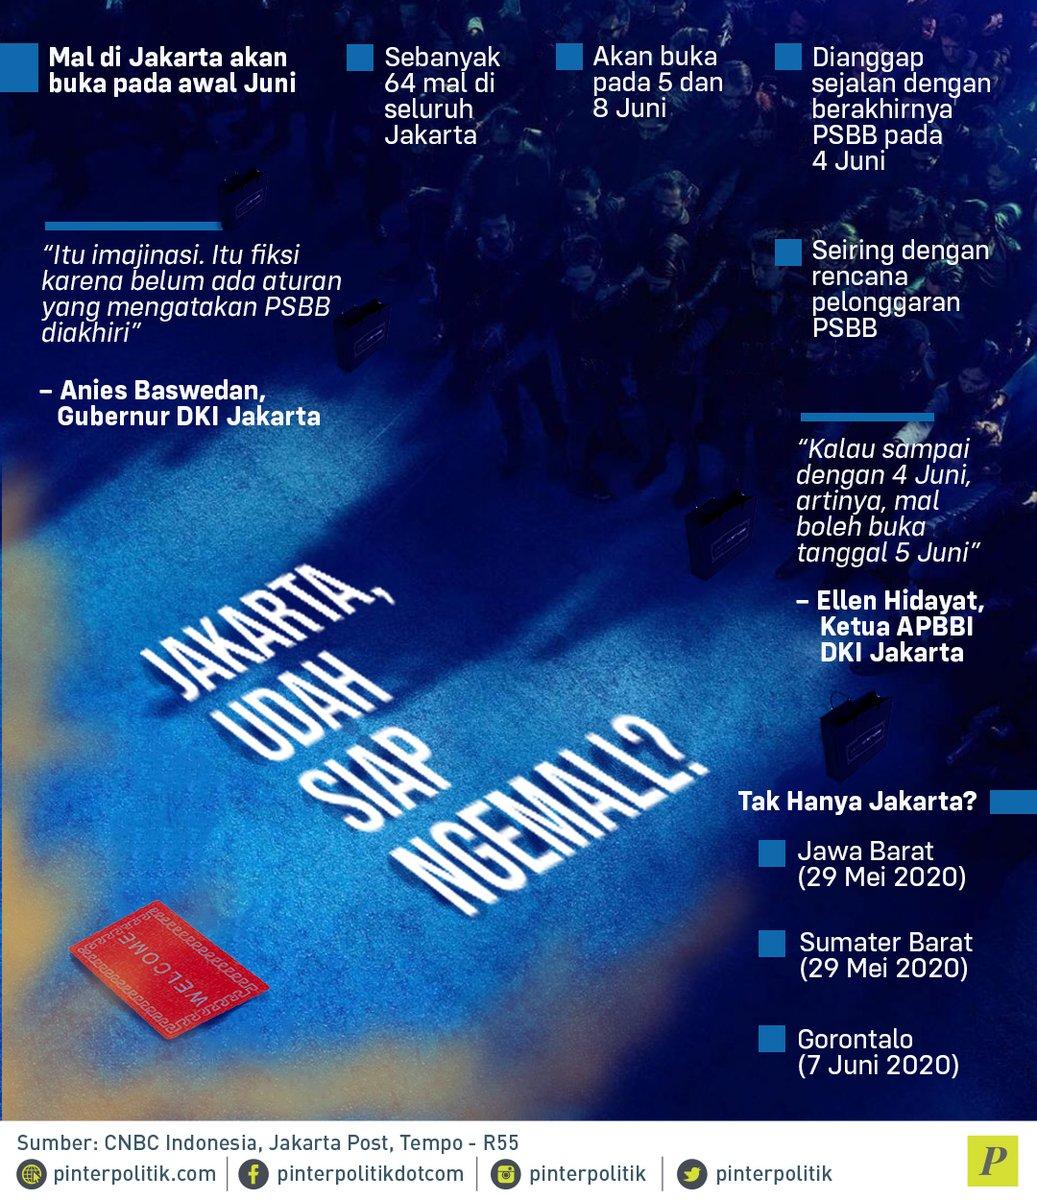 Pinterpolitik Com On Twitter Kamu Syuudah Siap Melantai Nge Mall Tapi Kata Pak Aniesbaswedan Kebijakannya Belum Keluar Dan Masih Fiksi So Ditahan Tahan Dulu Ya Covid19 Belum Berakhir Cuy Infografis Jakarta Psbb Politik Https T Co